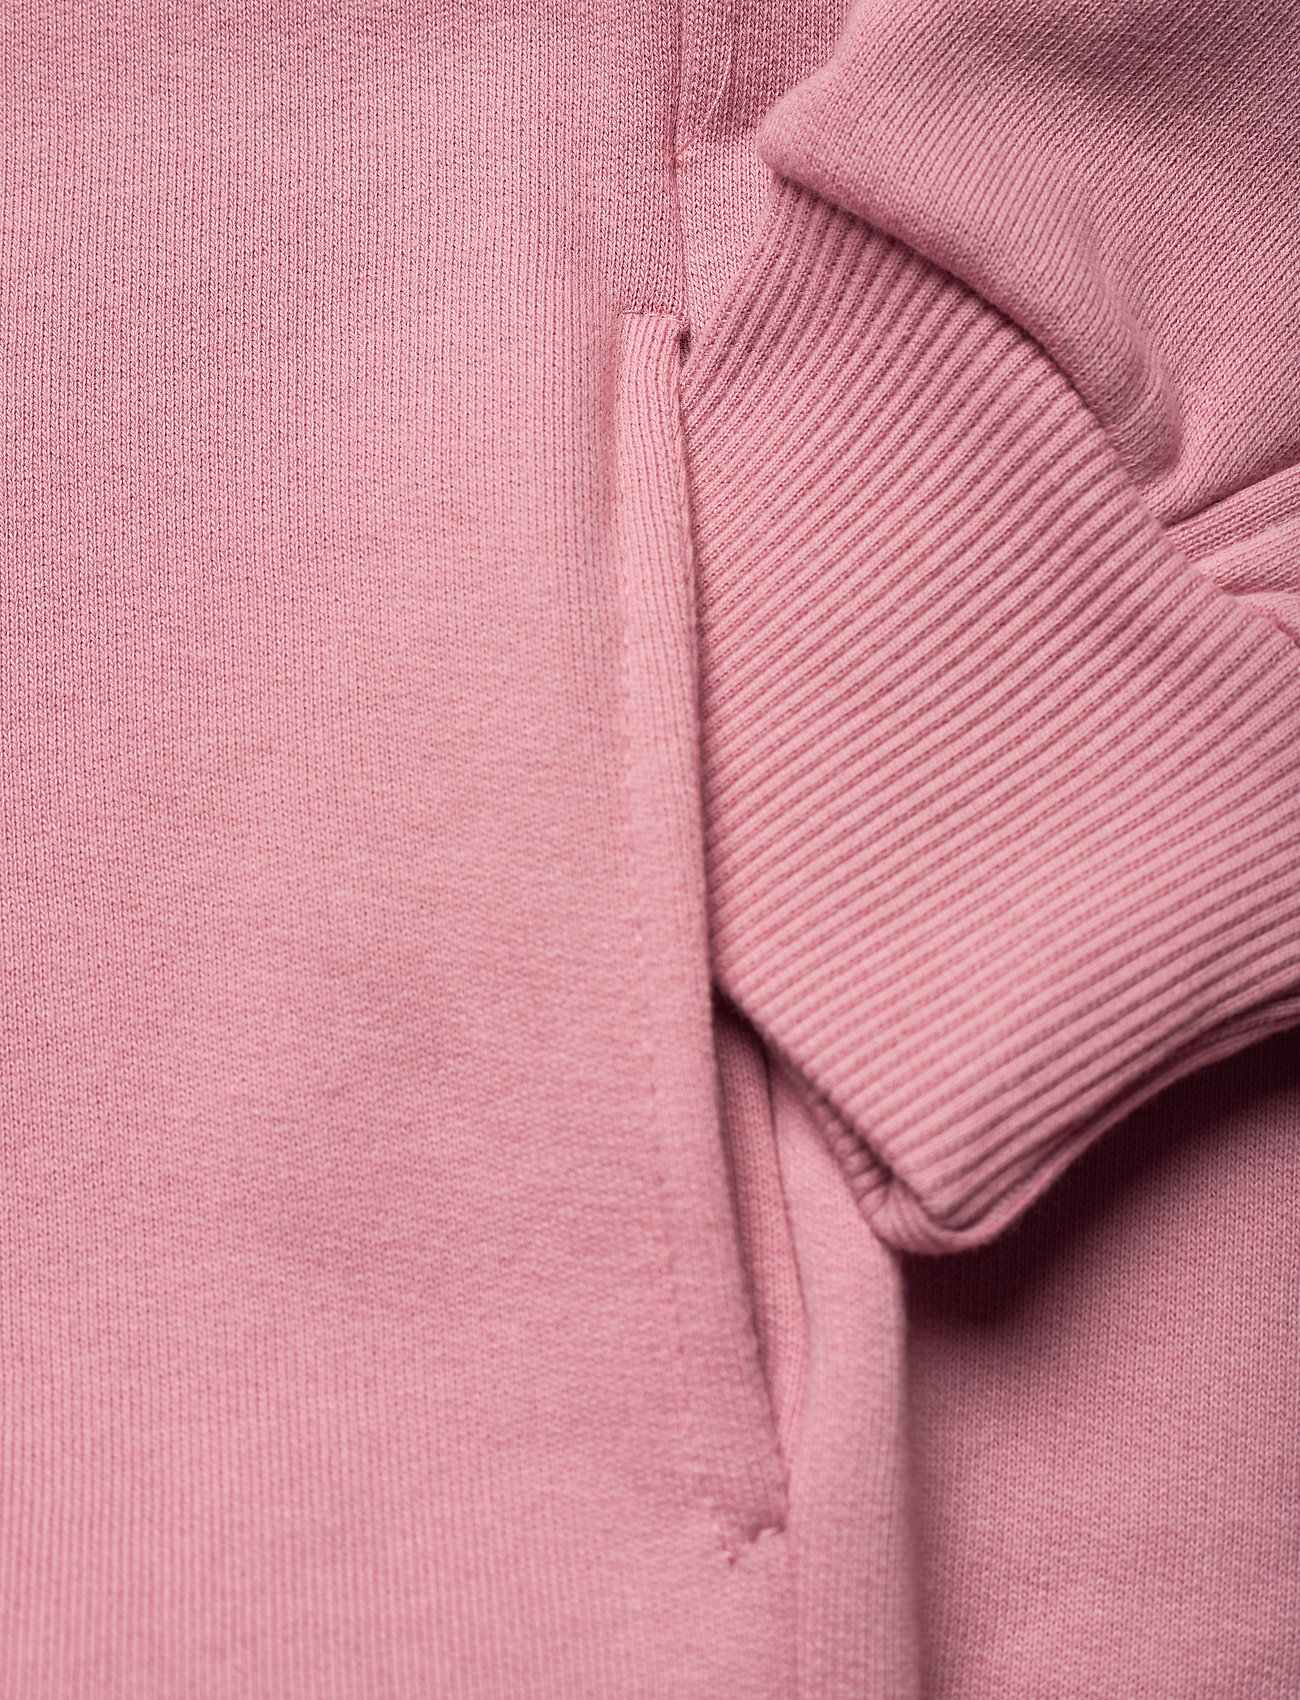 ROTATE Birger Christensen - Selma Hoddie Zip - sweatshirts en hoodies - lilas - 6